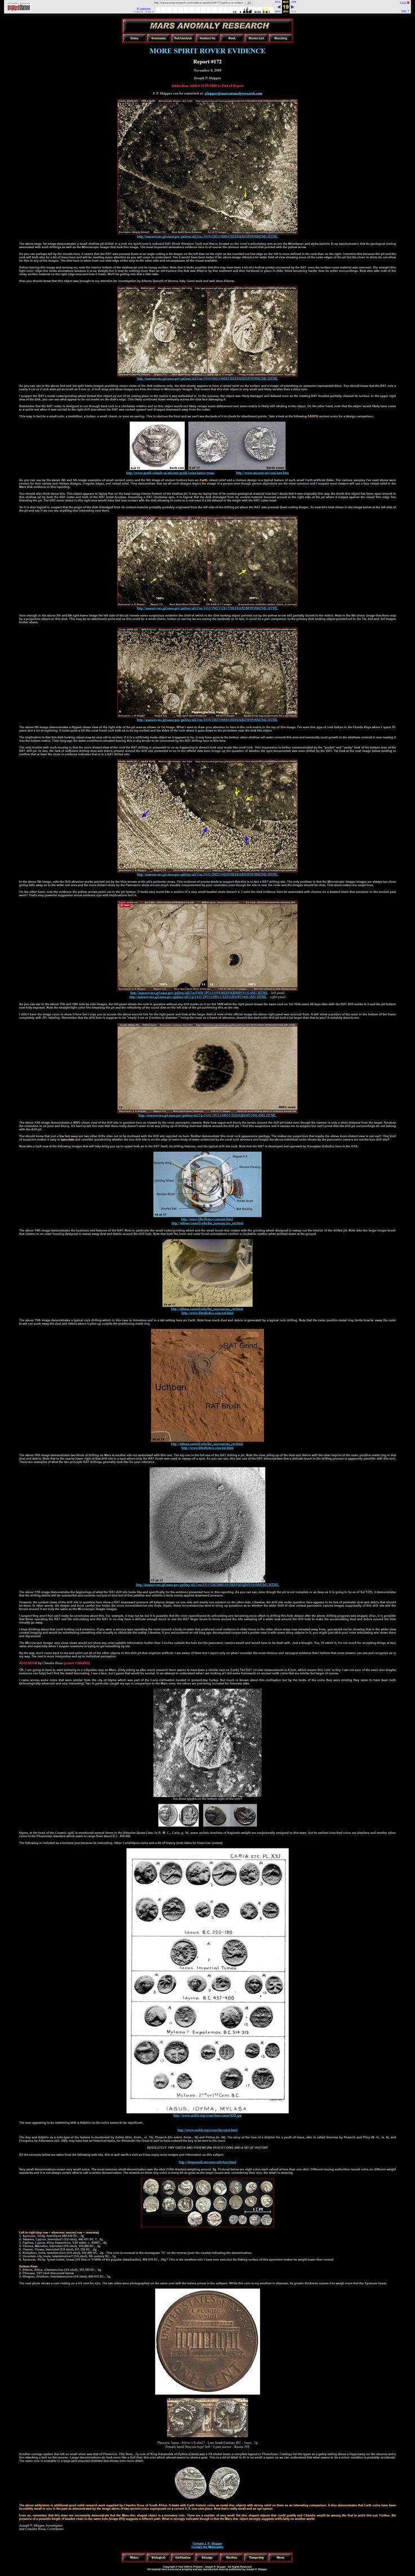 More Spirit Rover Evidence